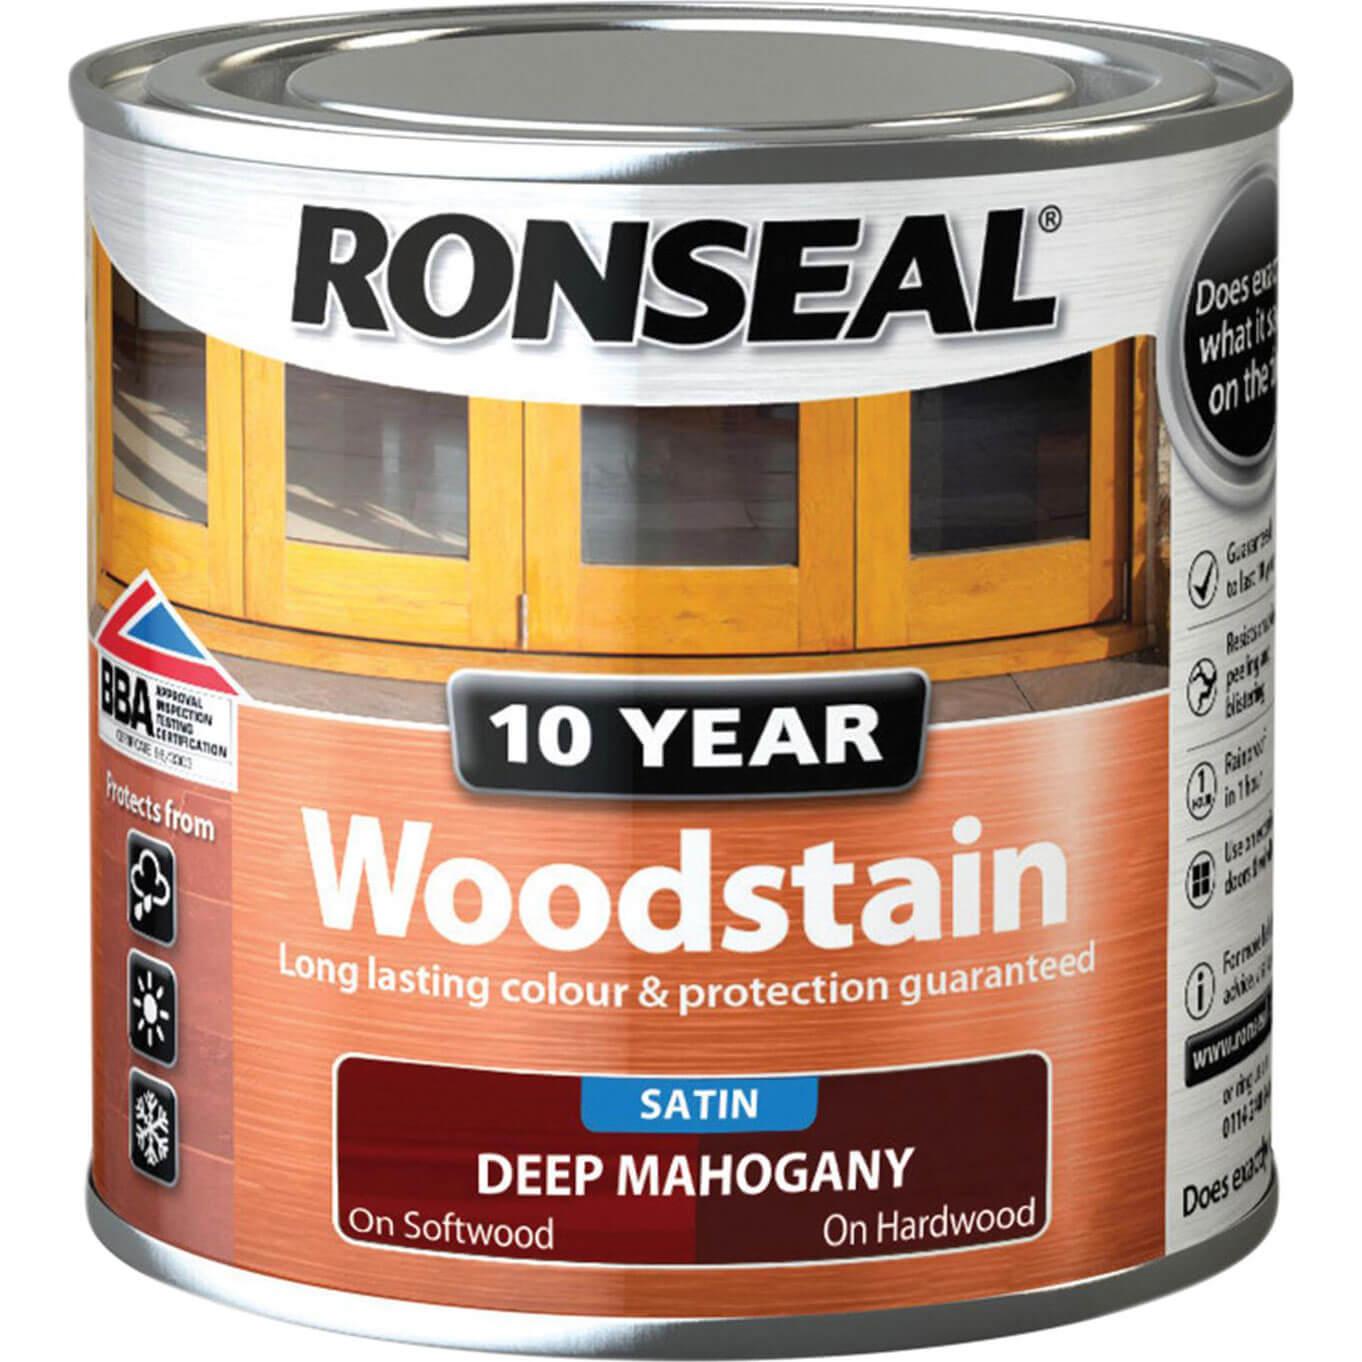 Image of Ronseal 10 Year Wood Stain Deep Mahogany 250ml